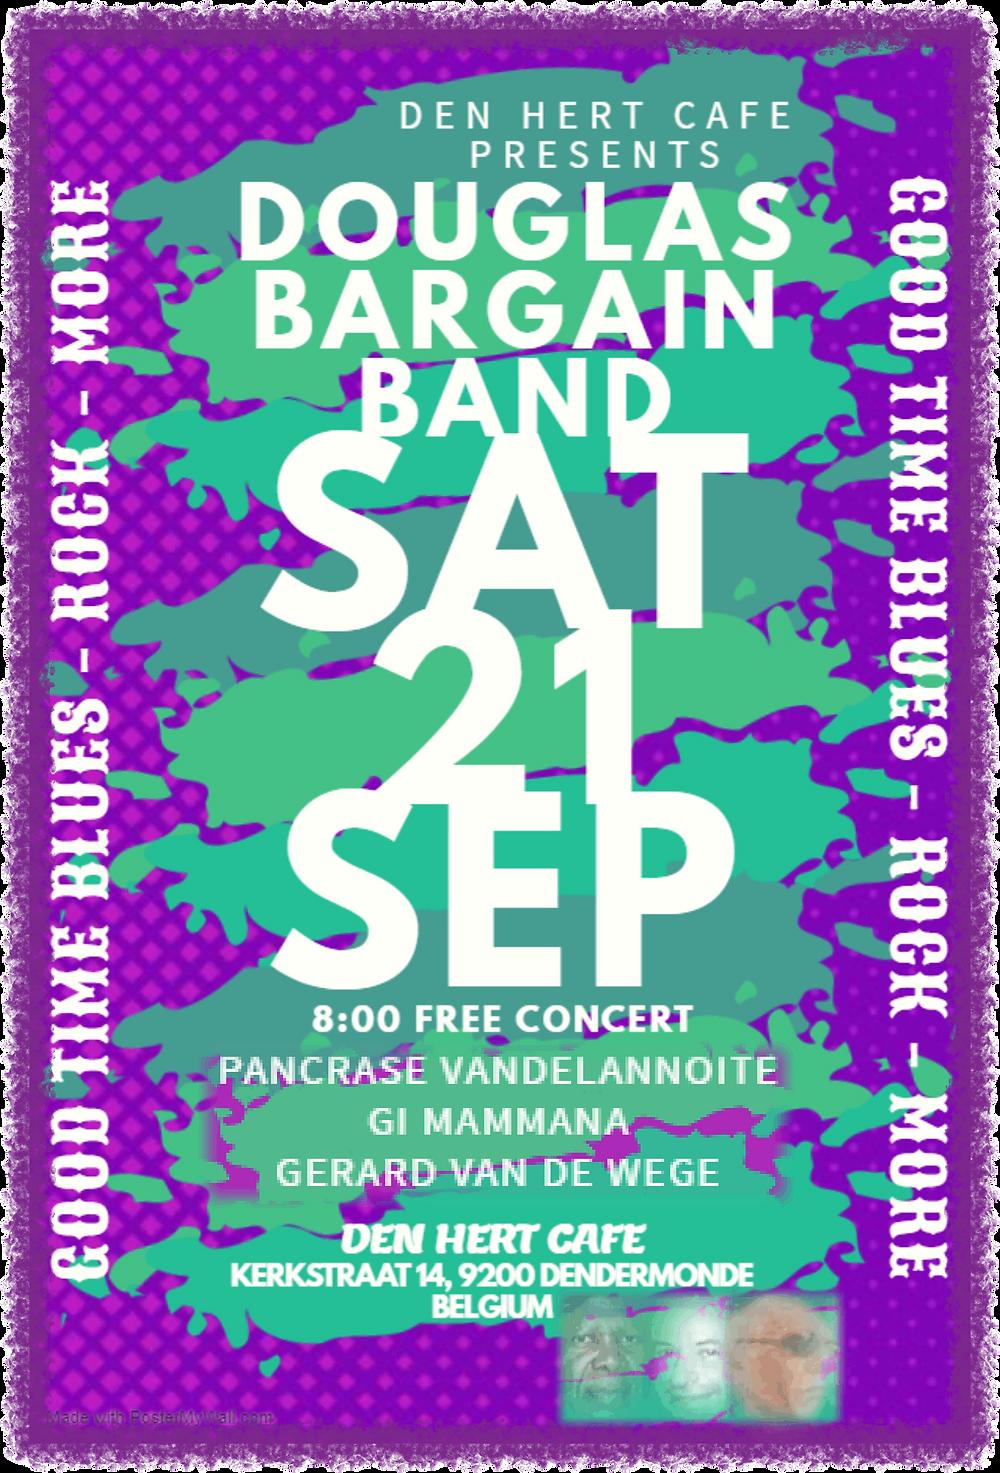 Pancrase, Myke & Gi Play Den Hert Cafe Saturday, September 21, 2019, a free Concert in Belgium!